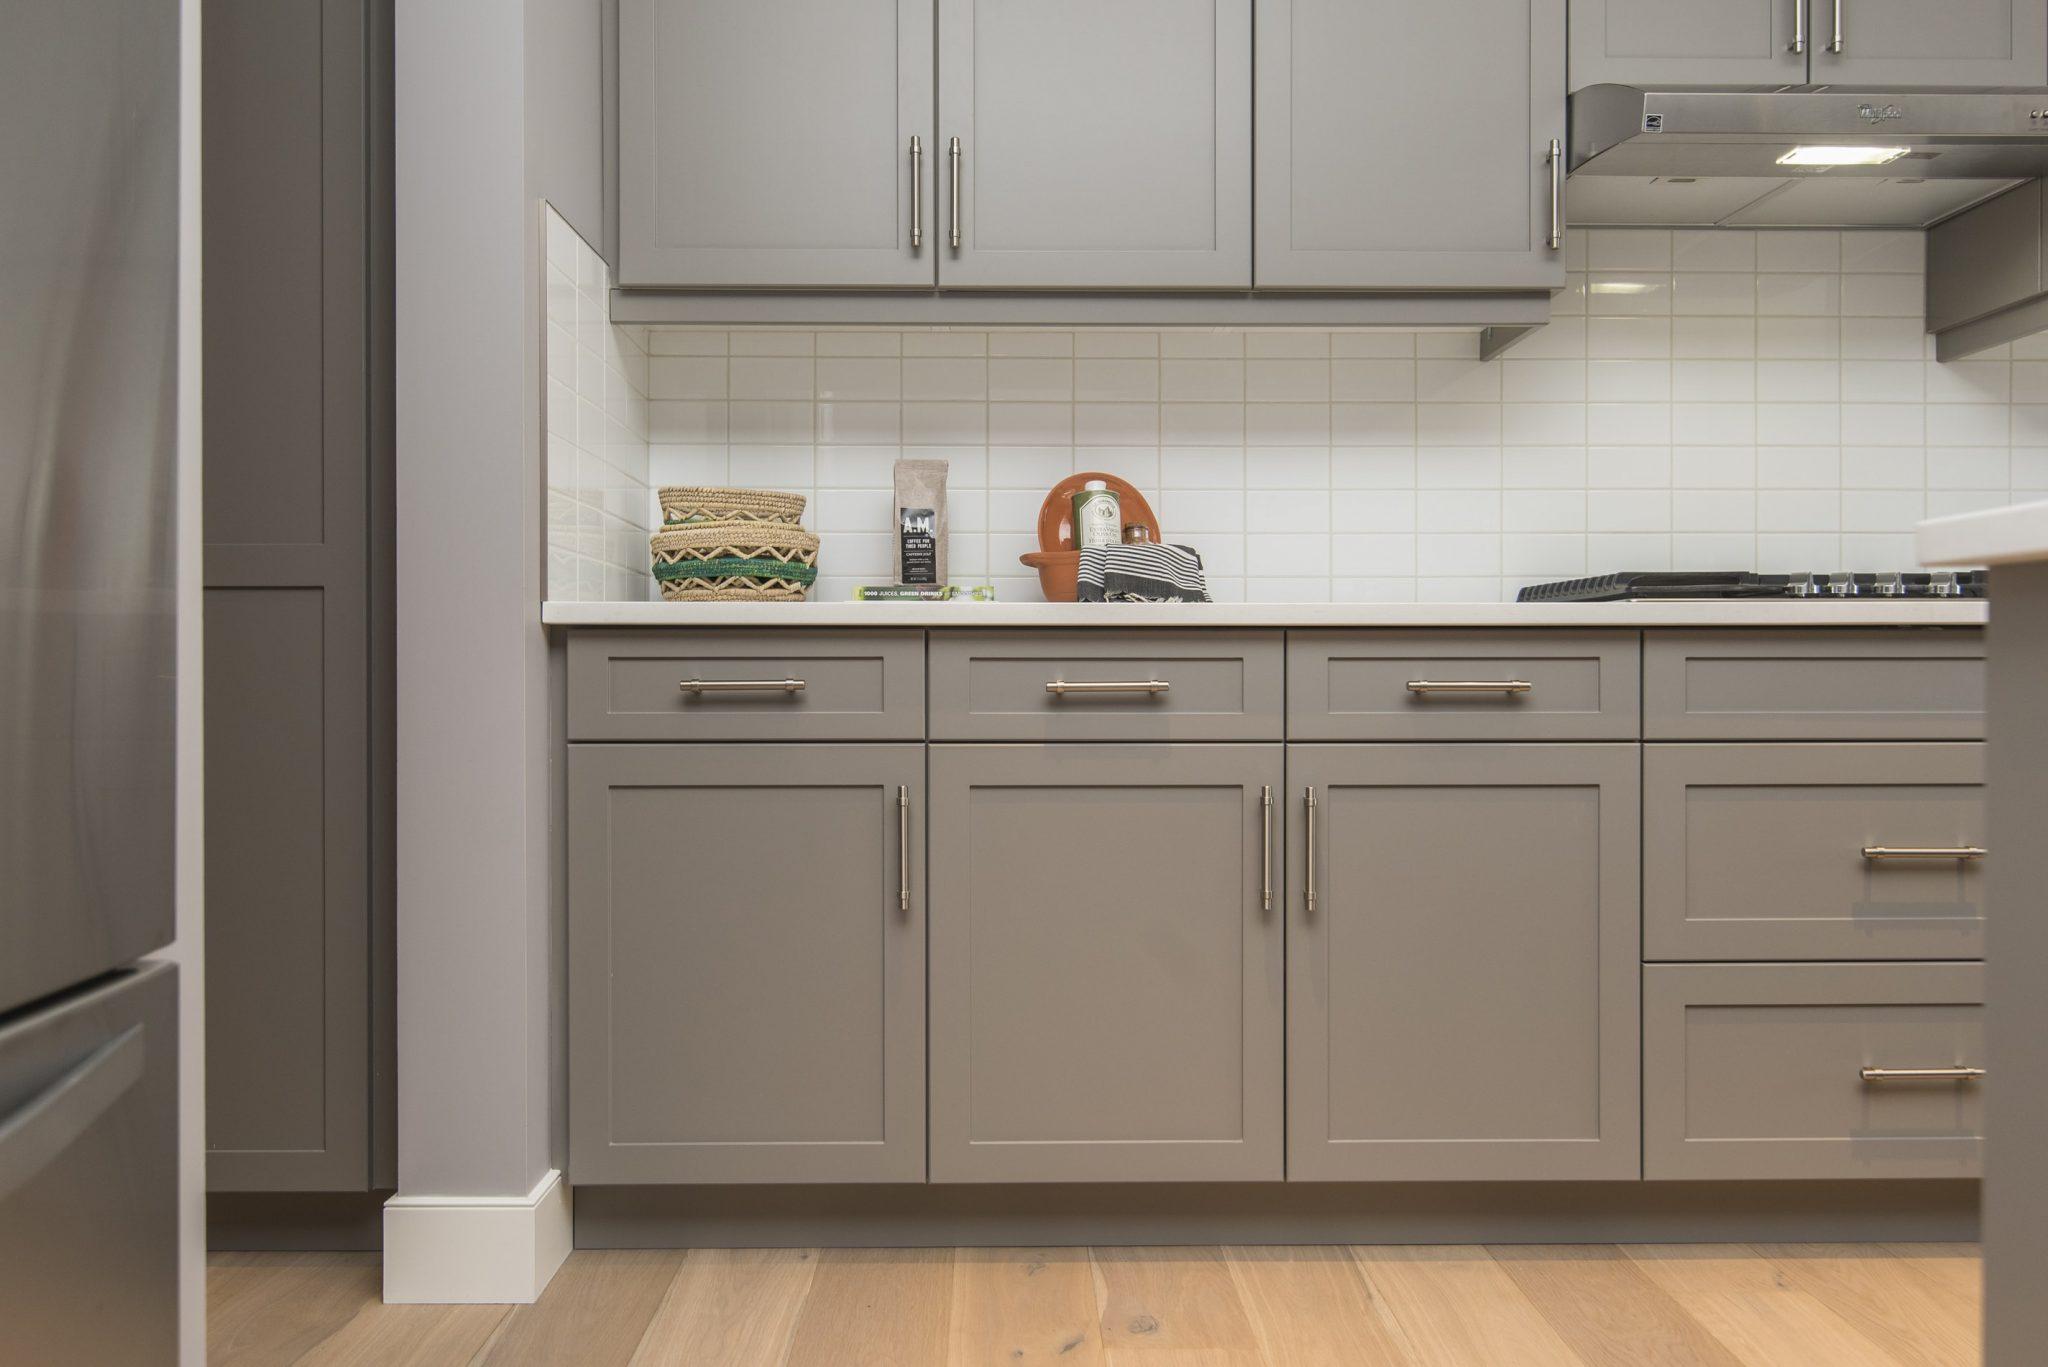 2019 Trends In Two Tone Kitchen Design Habitar Interior Design